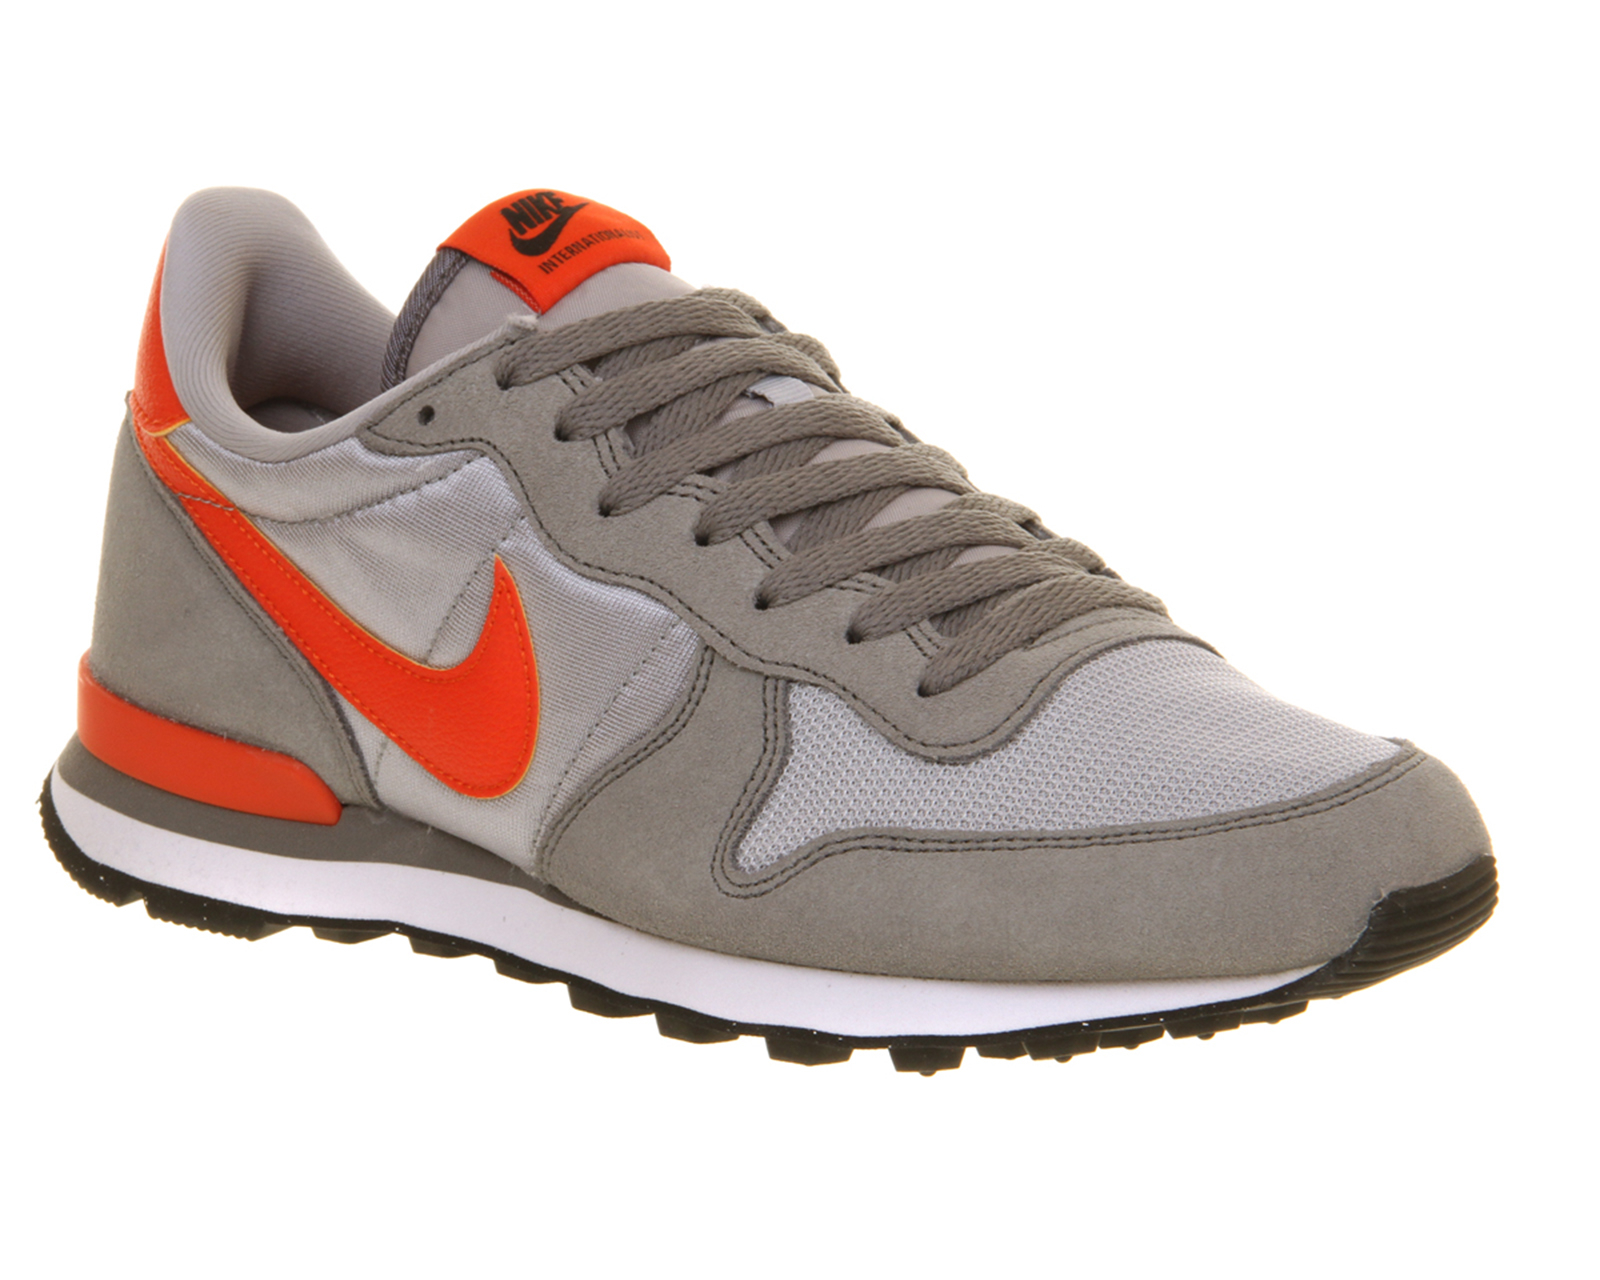 super popular 0560f d818e Lyst - Nike The Internationalist Sneakers - Multicolor in .